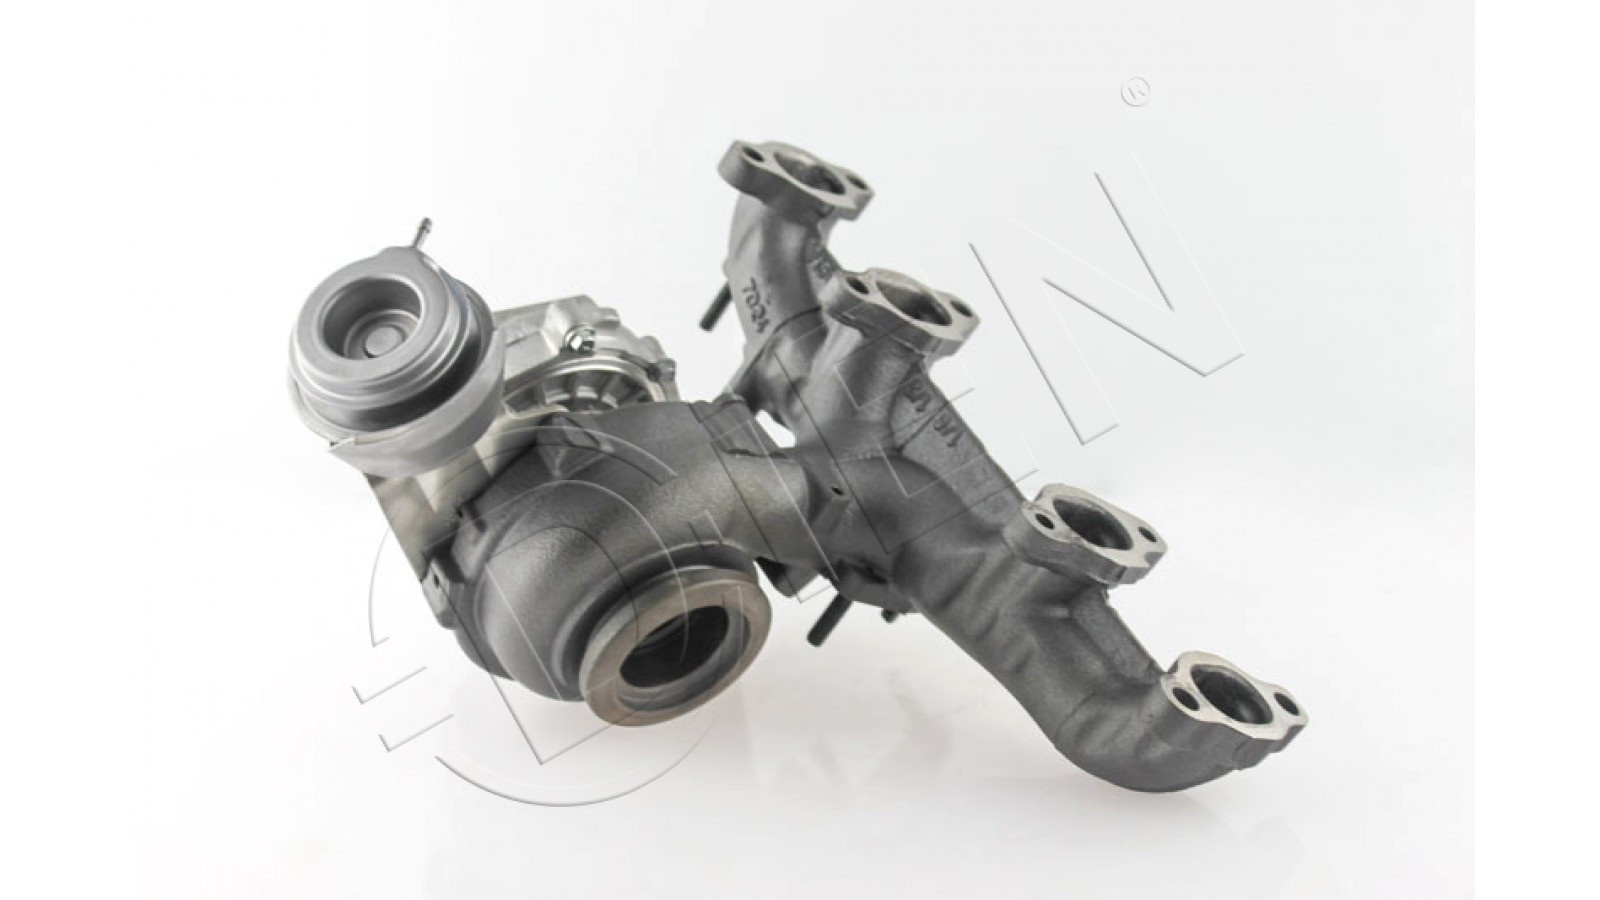 Turbocompressore  VOLKSWAGEN  EOS  2.0 TDI  140Cv  1968ccm  giu 2006 - mag 2008